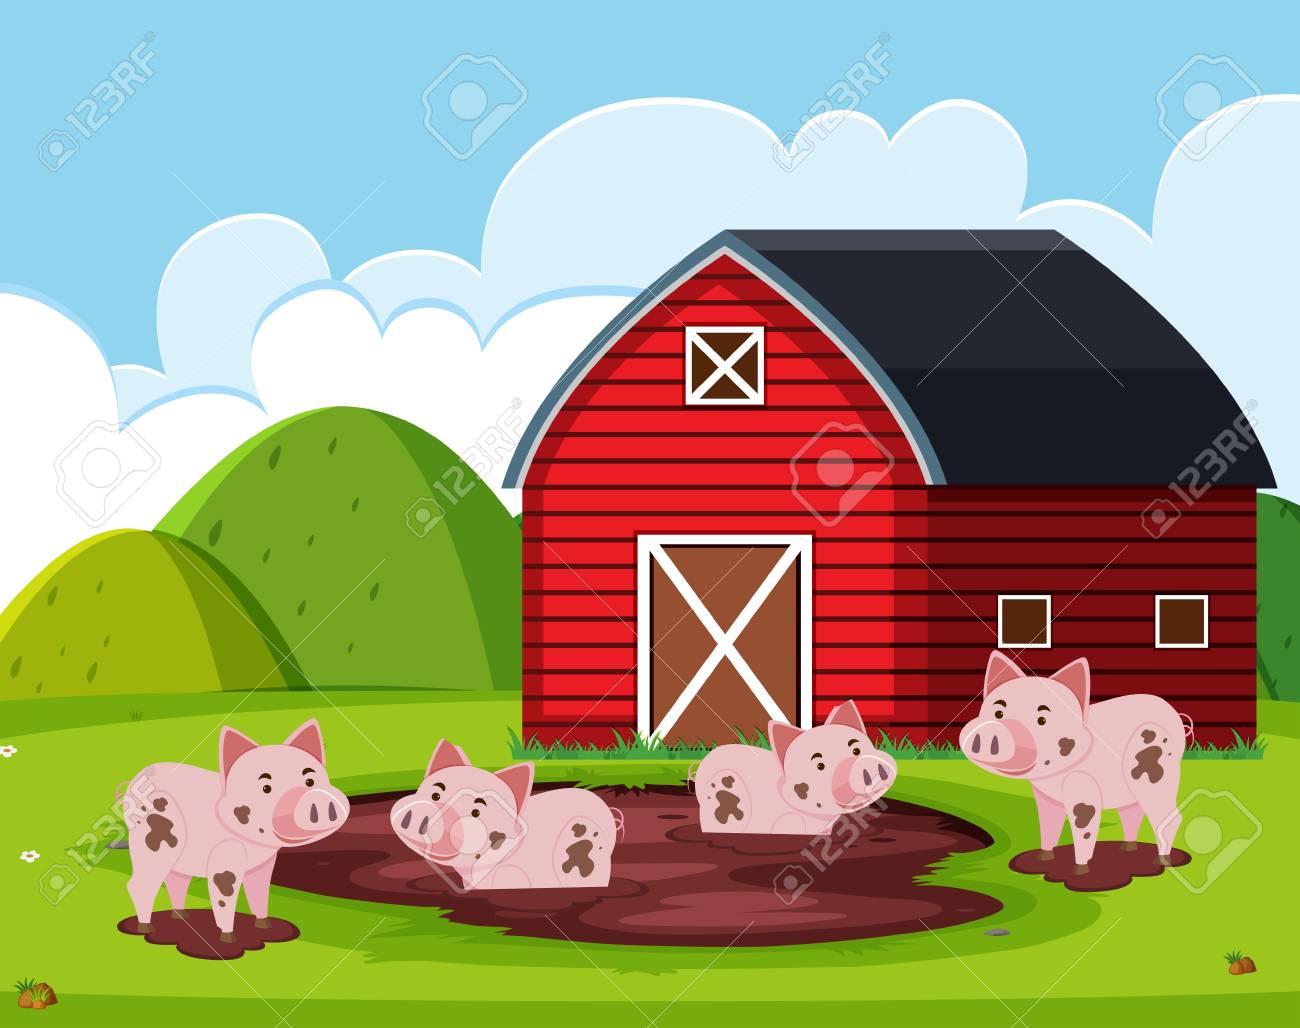 Pig at the barn house illustration.